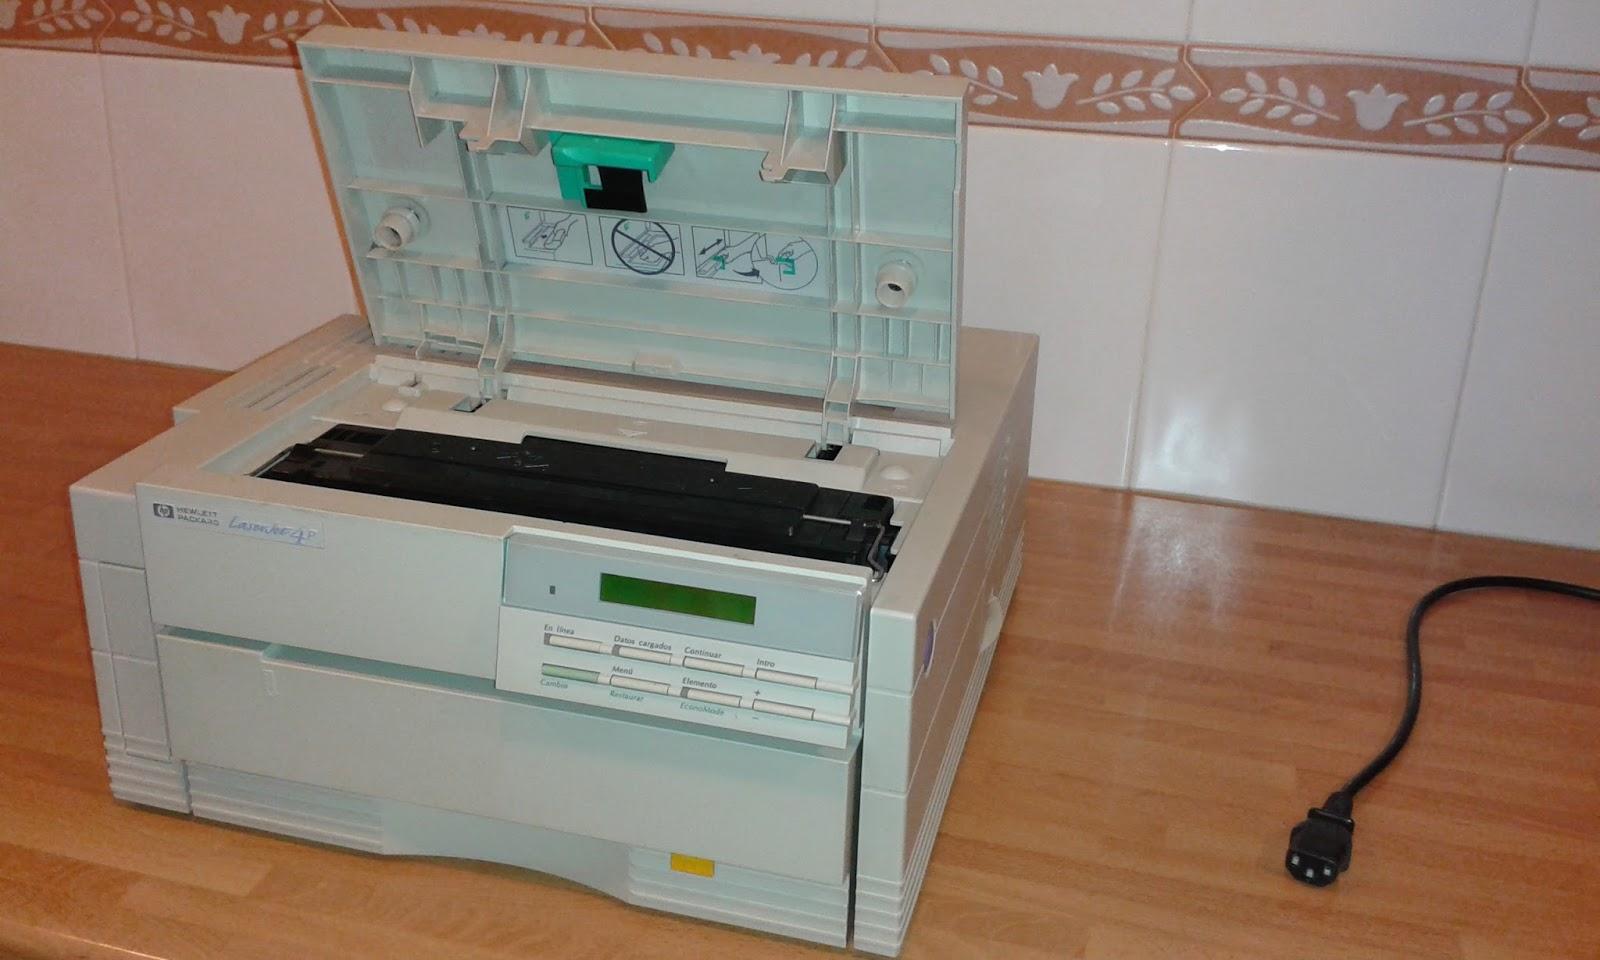 Plan Renove Impresoras Carrefour Experiencia Nefasta